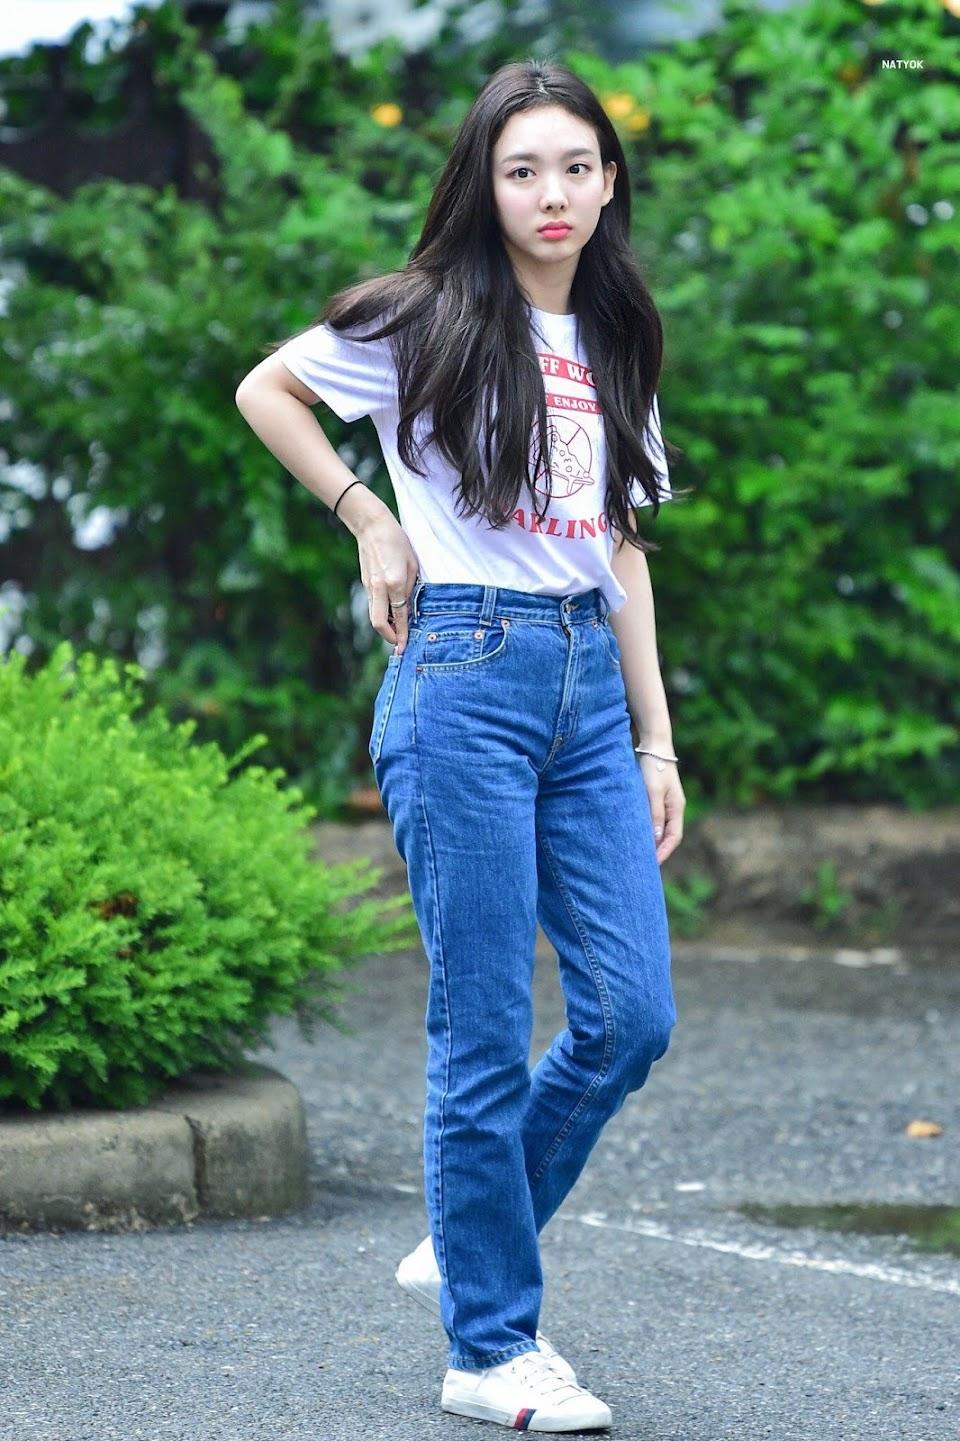 twice-nayeon-shoes